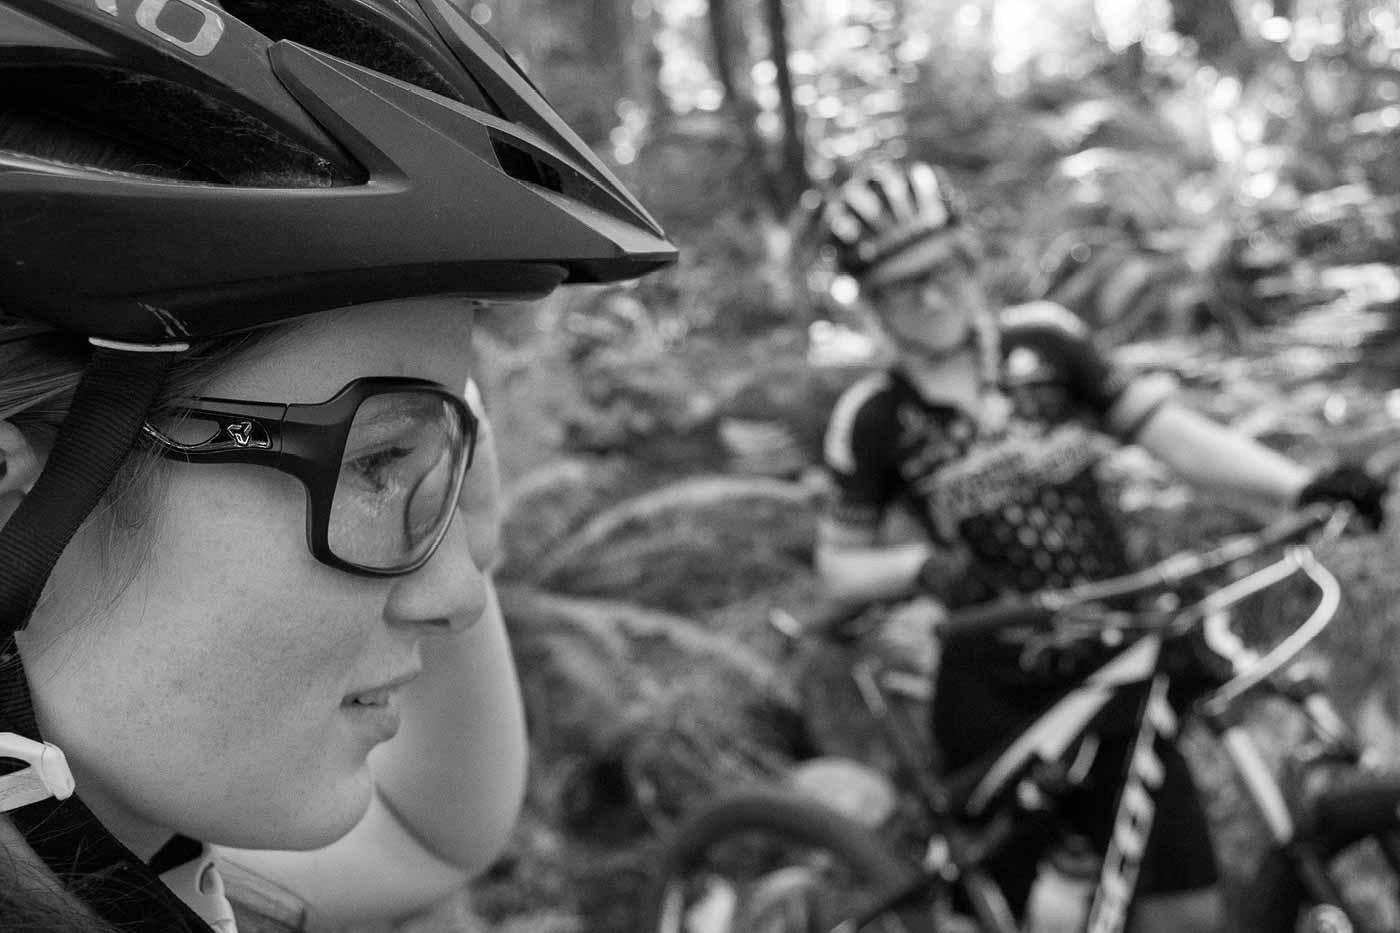 d0054c334a First Look  Ryders Eyewear 2016 Line - Mountain Bikes Feature ...